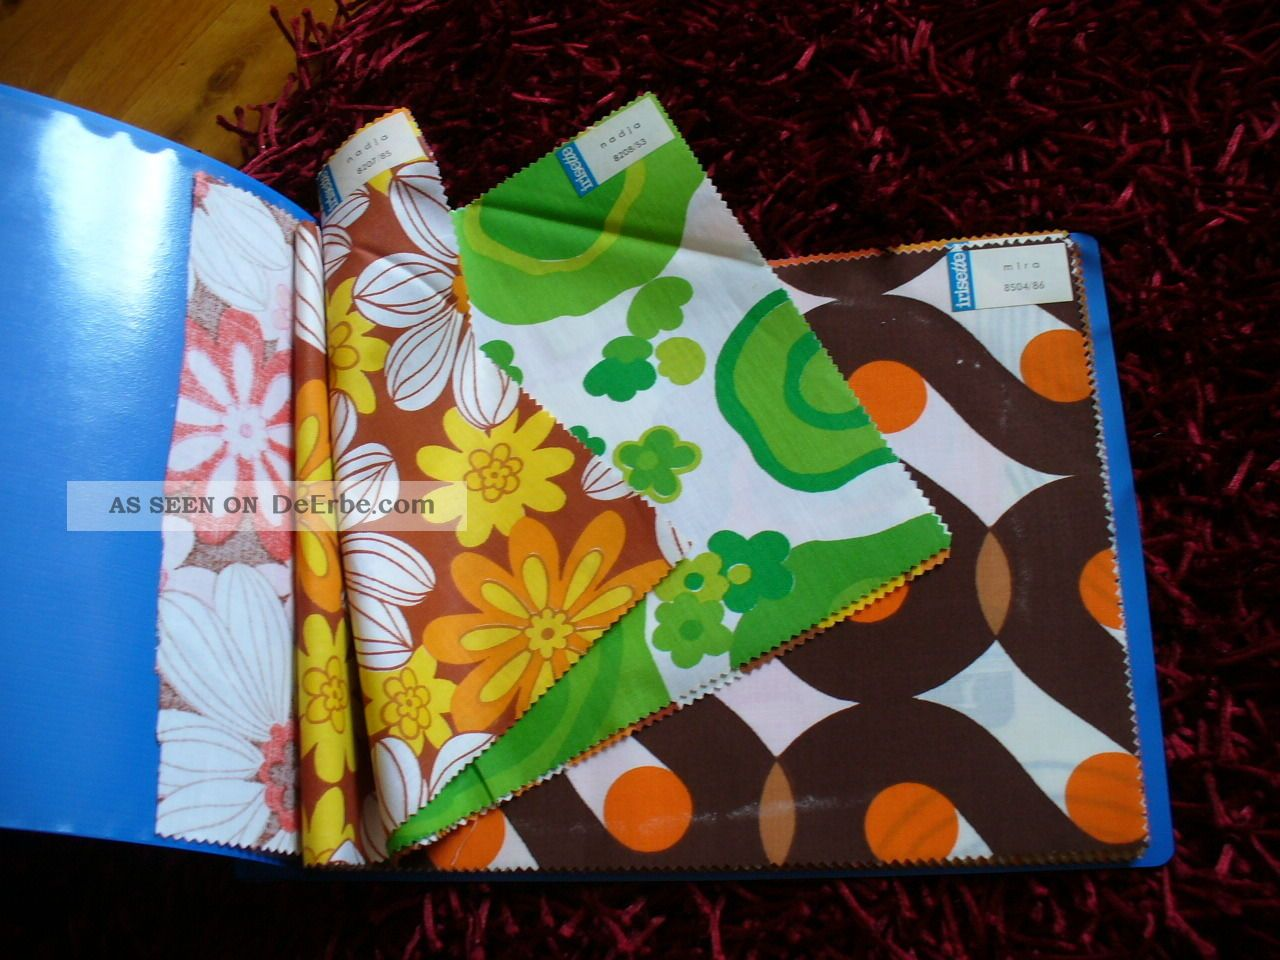 70er jahre irisette musterbuch stoff stoffmuster stoffe vintage 1970. Black Bedroom Furniture Sets. Home Design Ideas